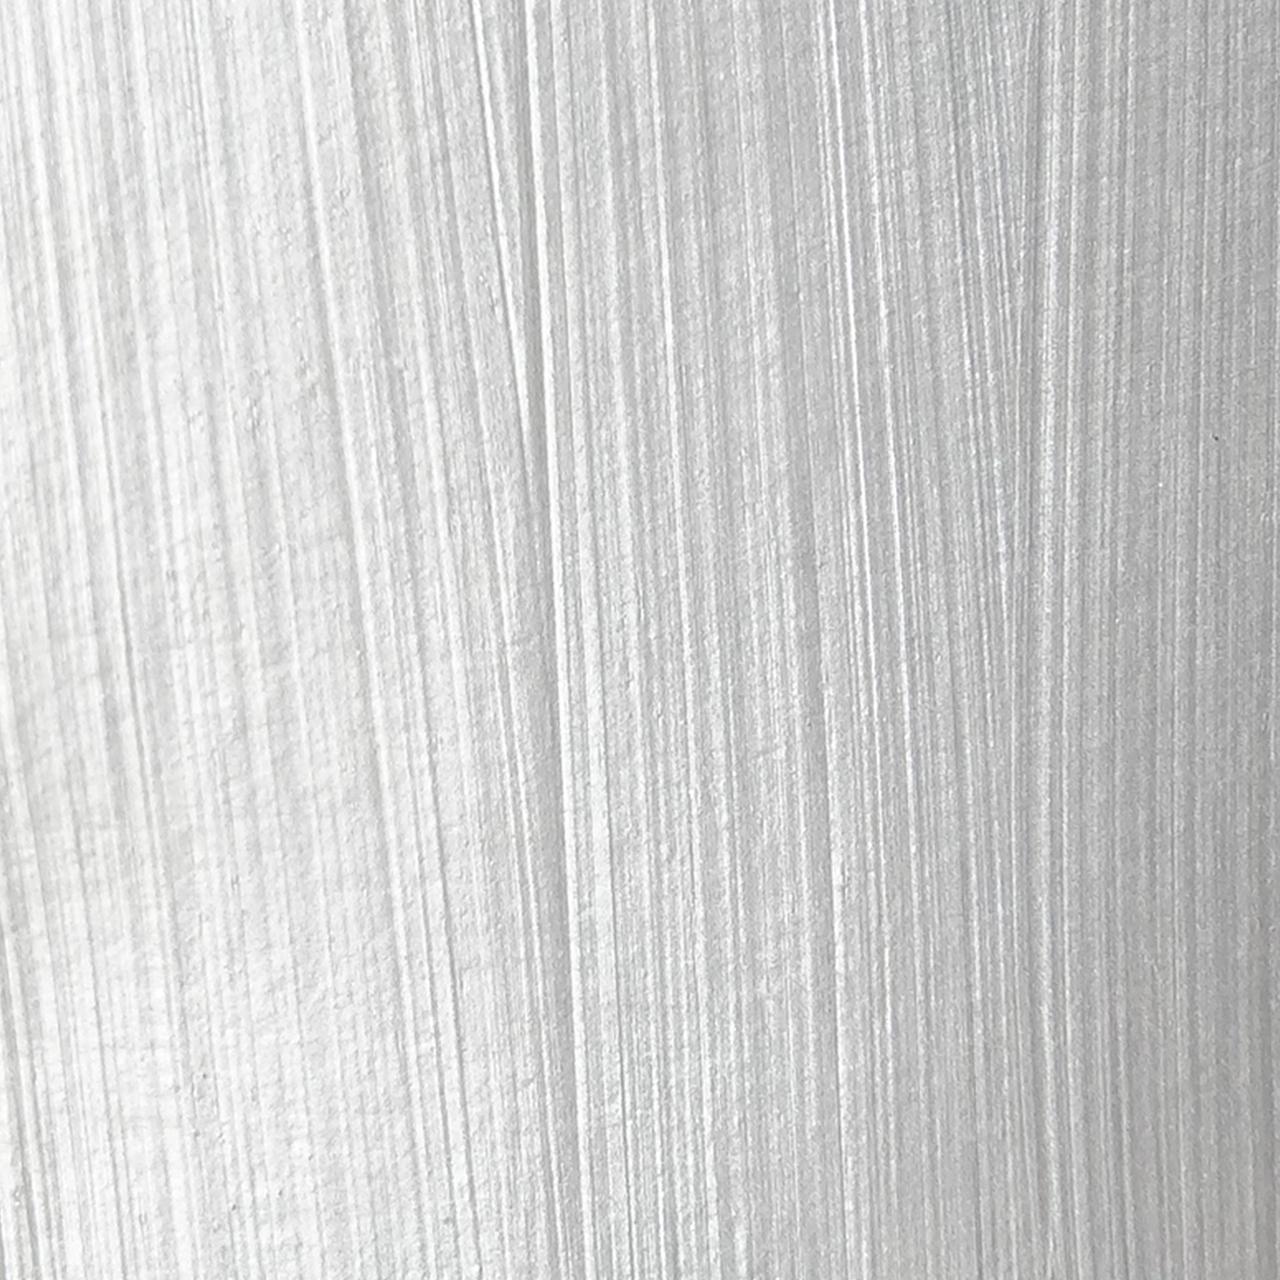 Декоративная краска, Pearl and Metallic, кристалл, 50 мл, ScrapEgo